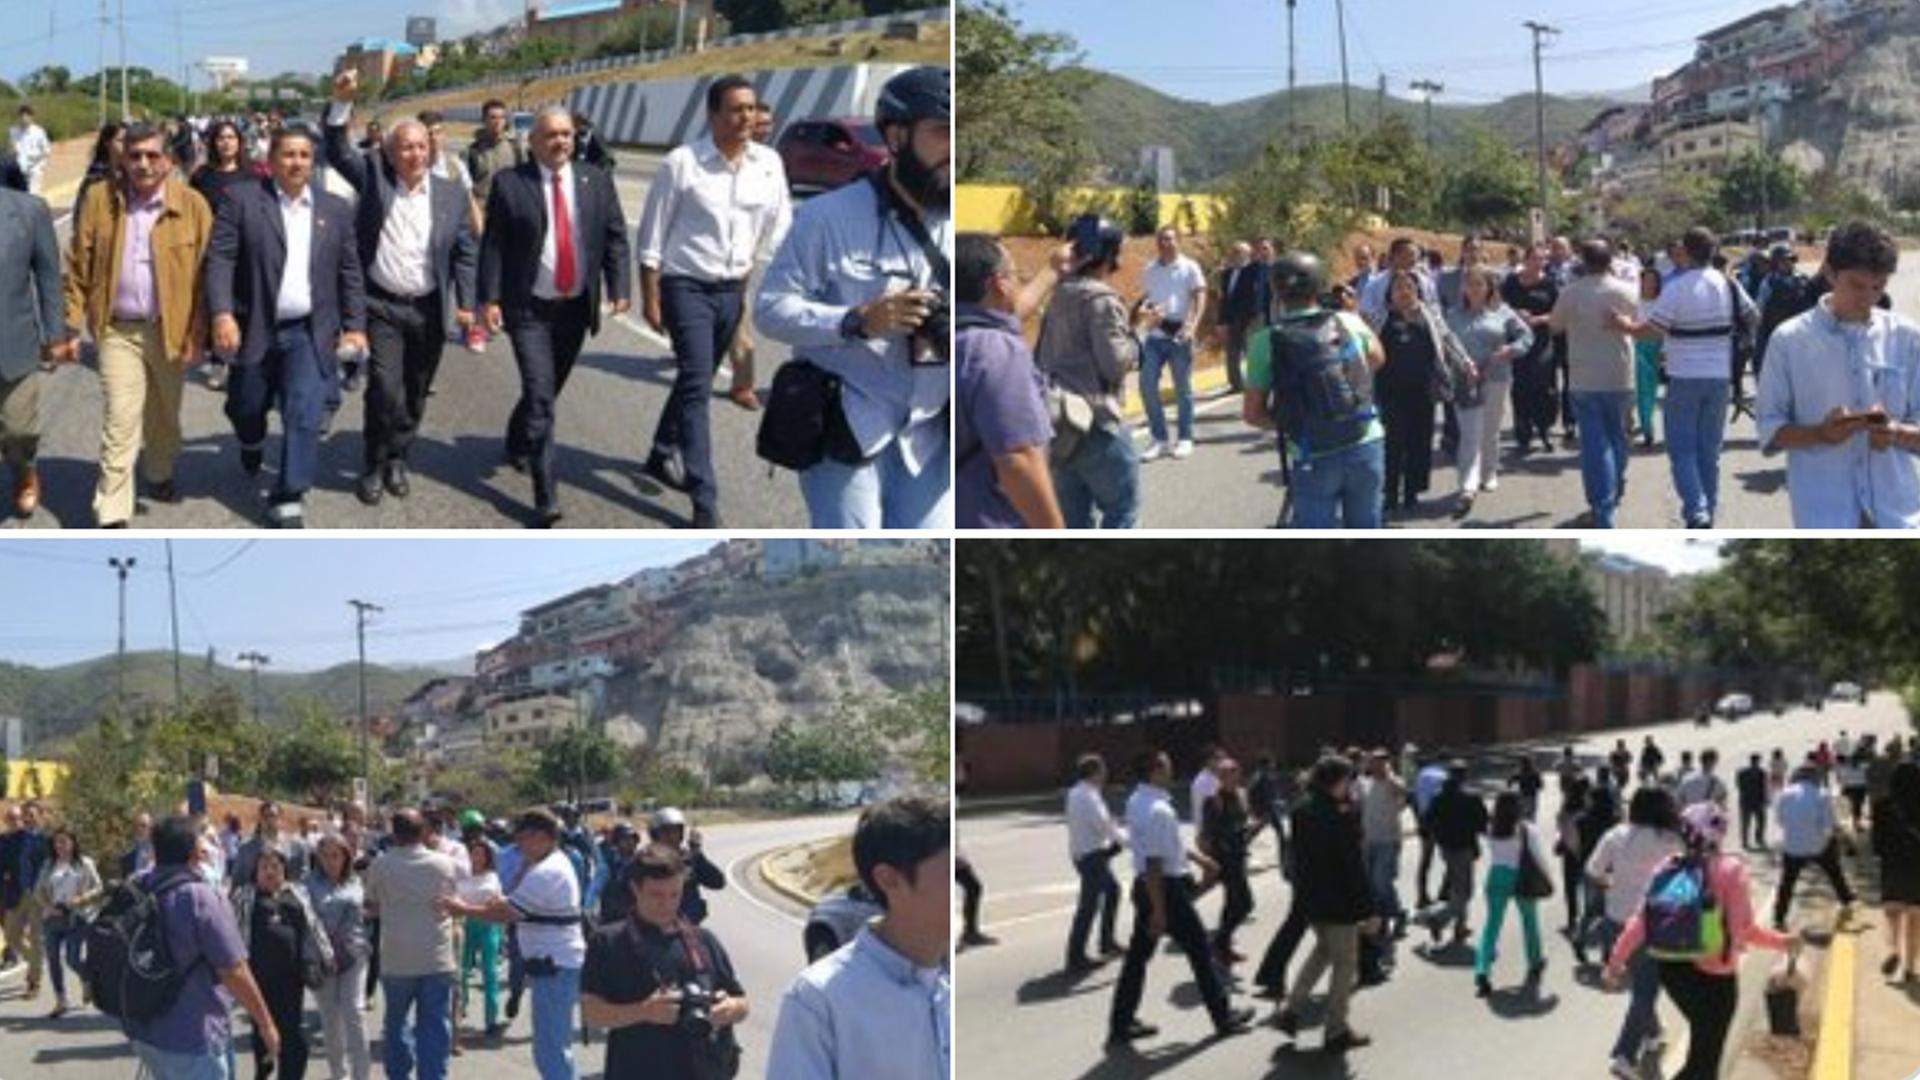 PNB detuvo caravana de diputados que se trasladaba a La Guaira